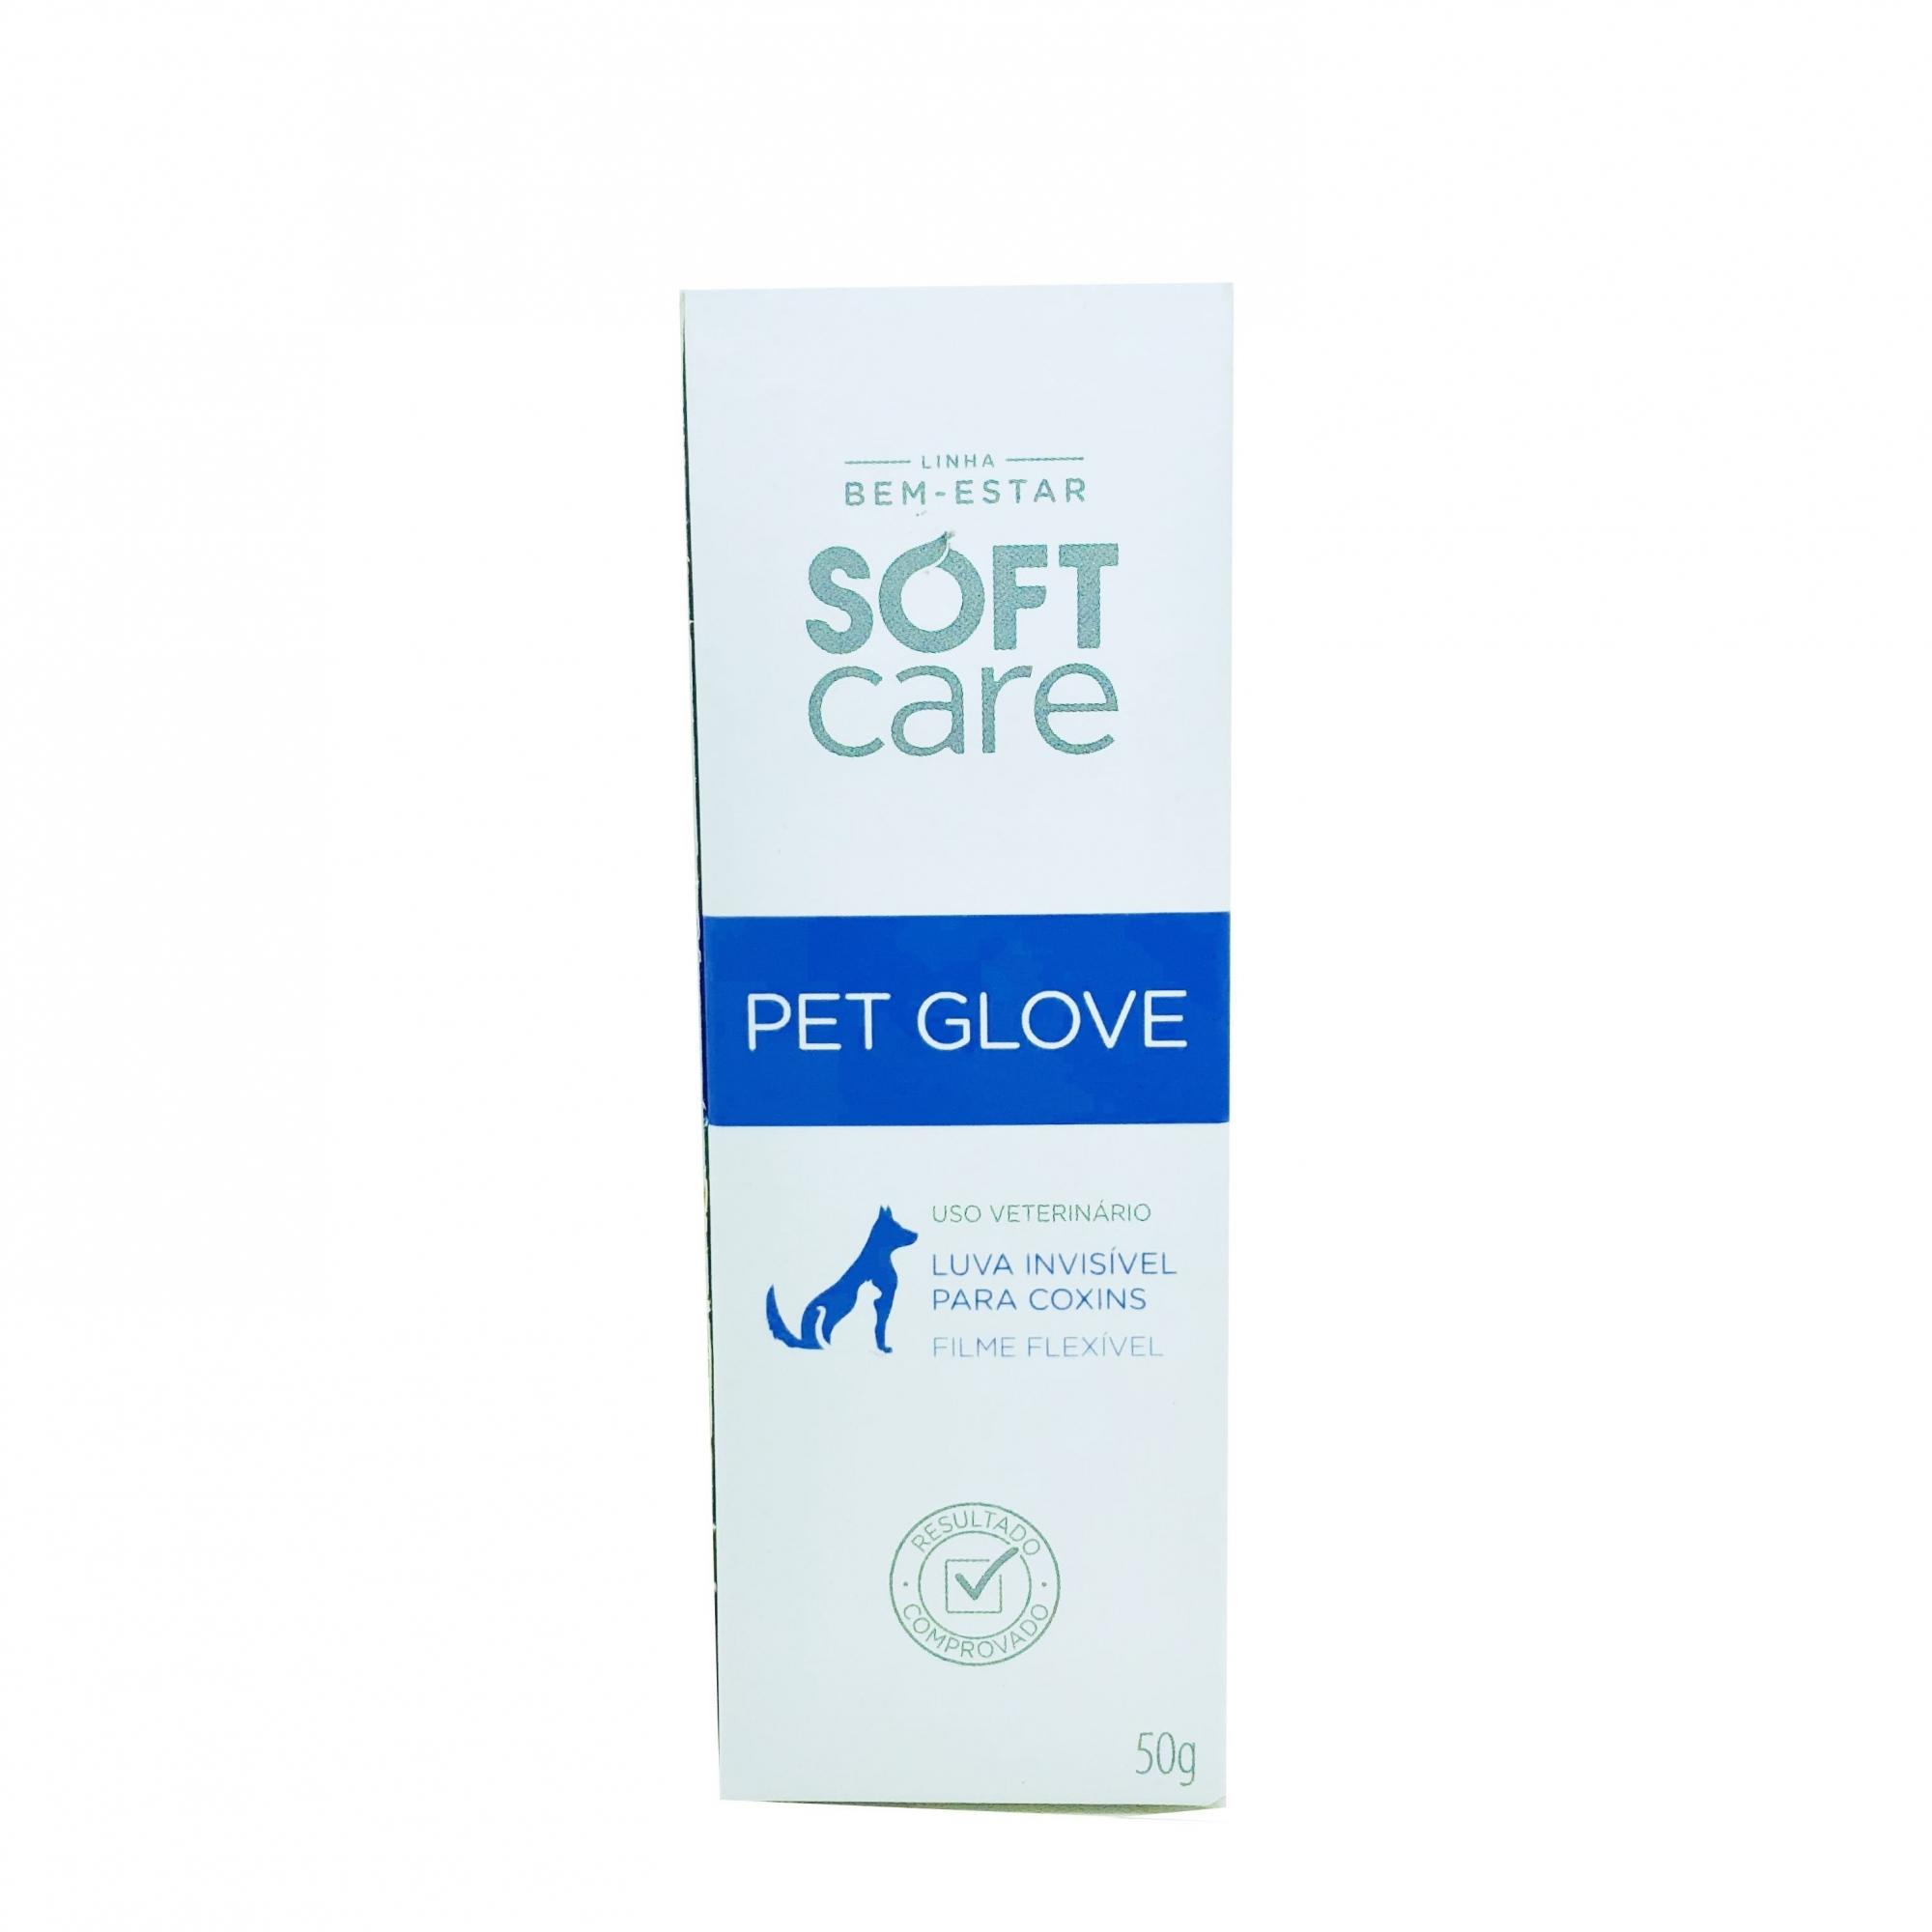 Soft Care Pet Glove 50g